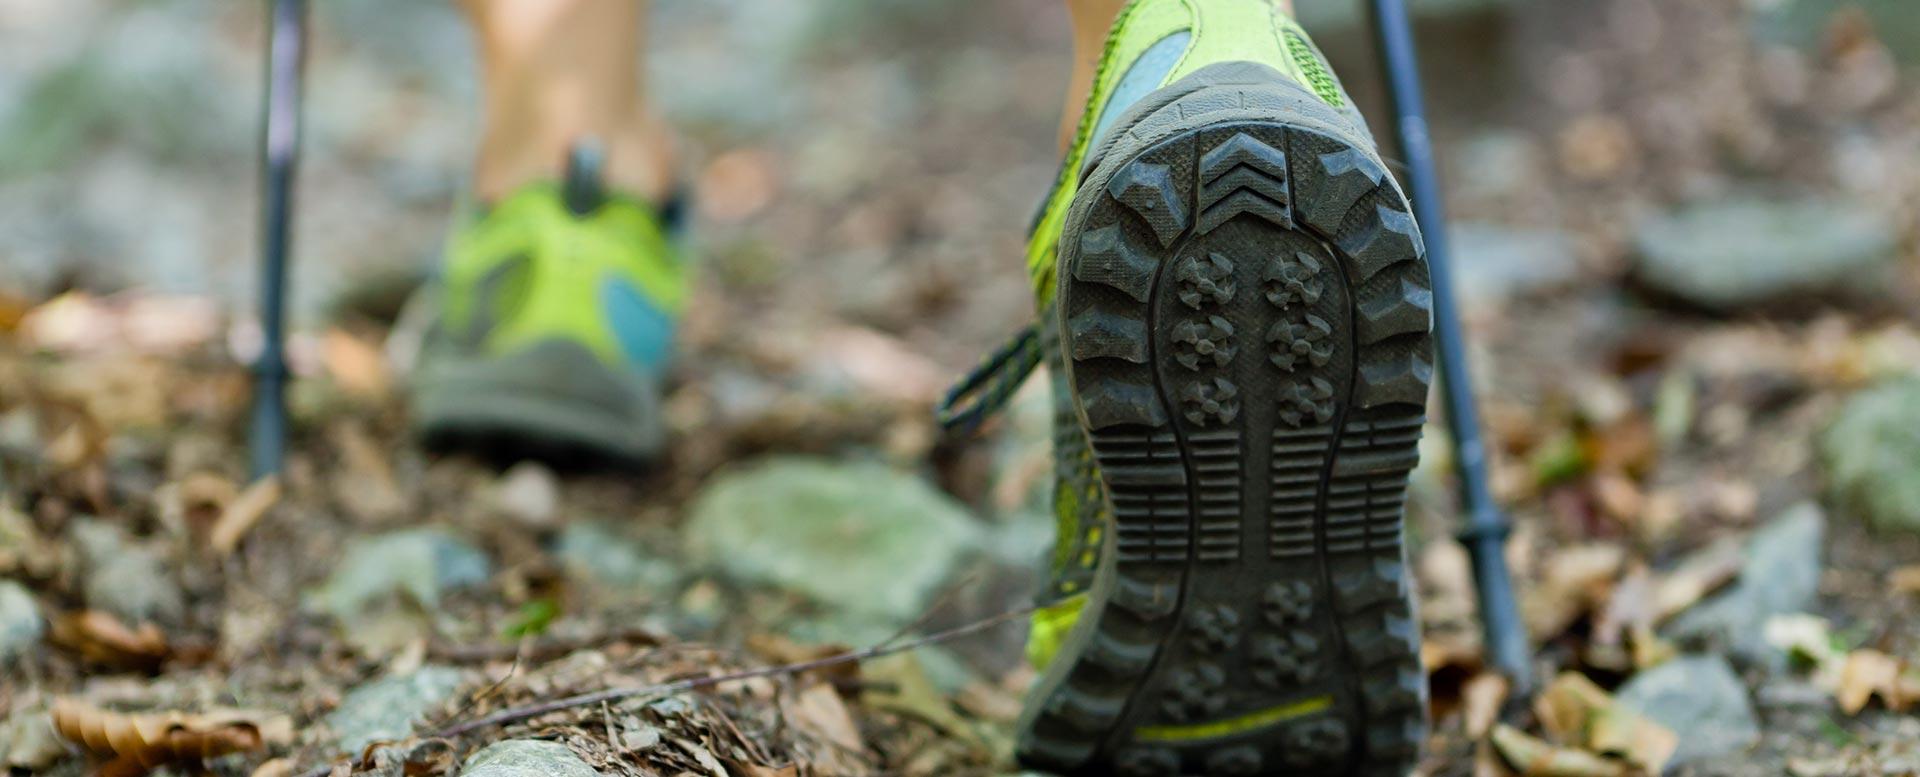 Nordic-Walking-Technik: Tipps